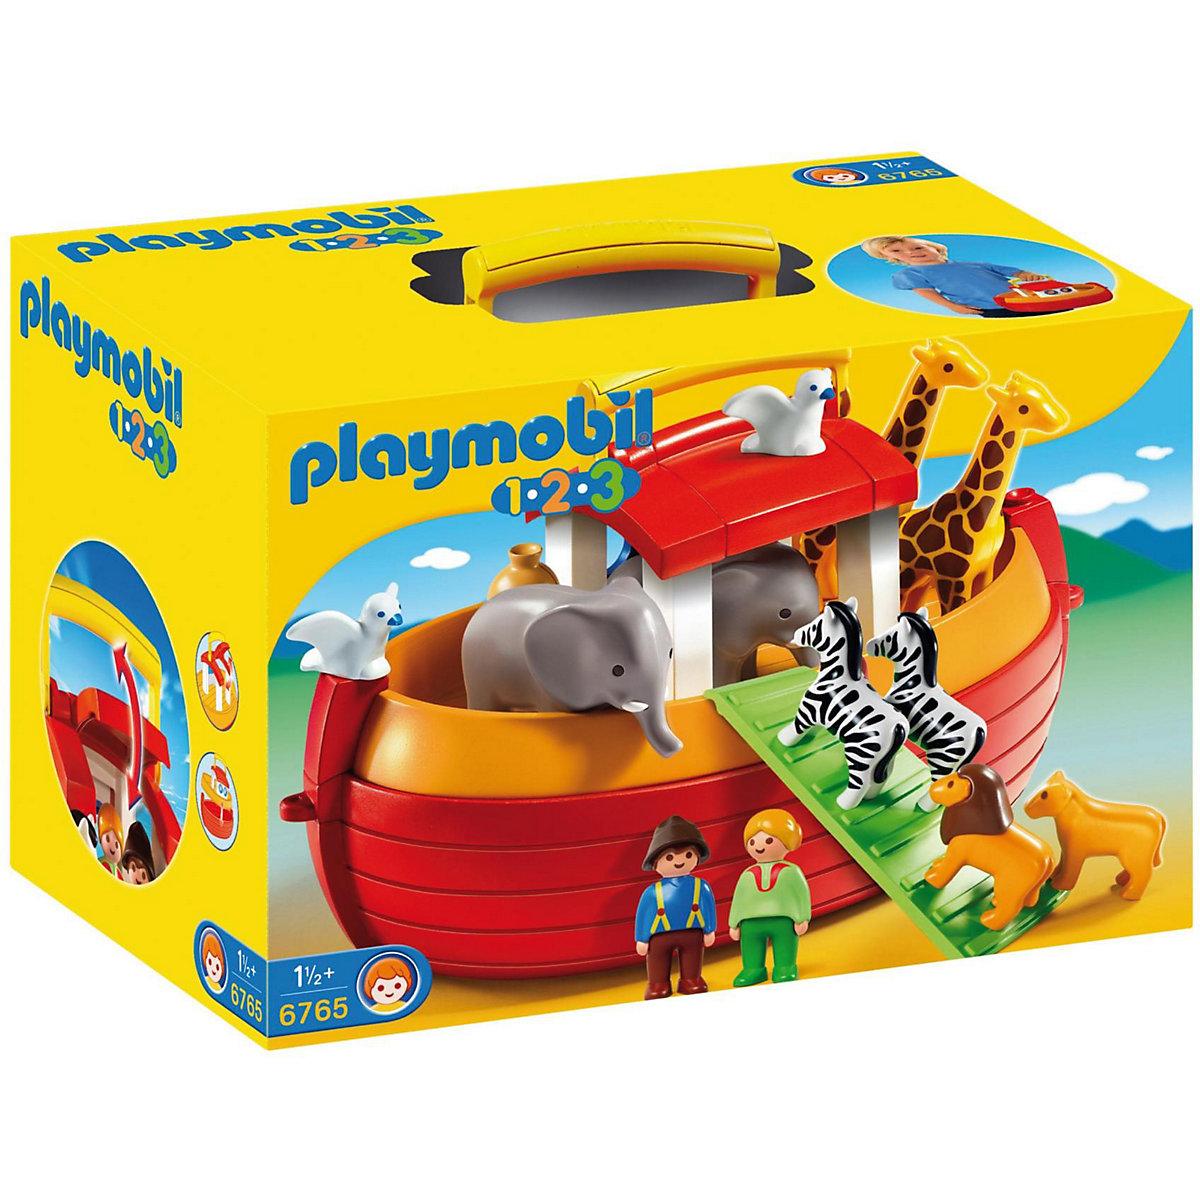 playmobil 6765 1 2 3 meine mitnehm arche noah playmobil. Black Bedroom Furniture Sets. Home Design Ideas